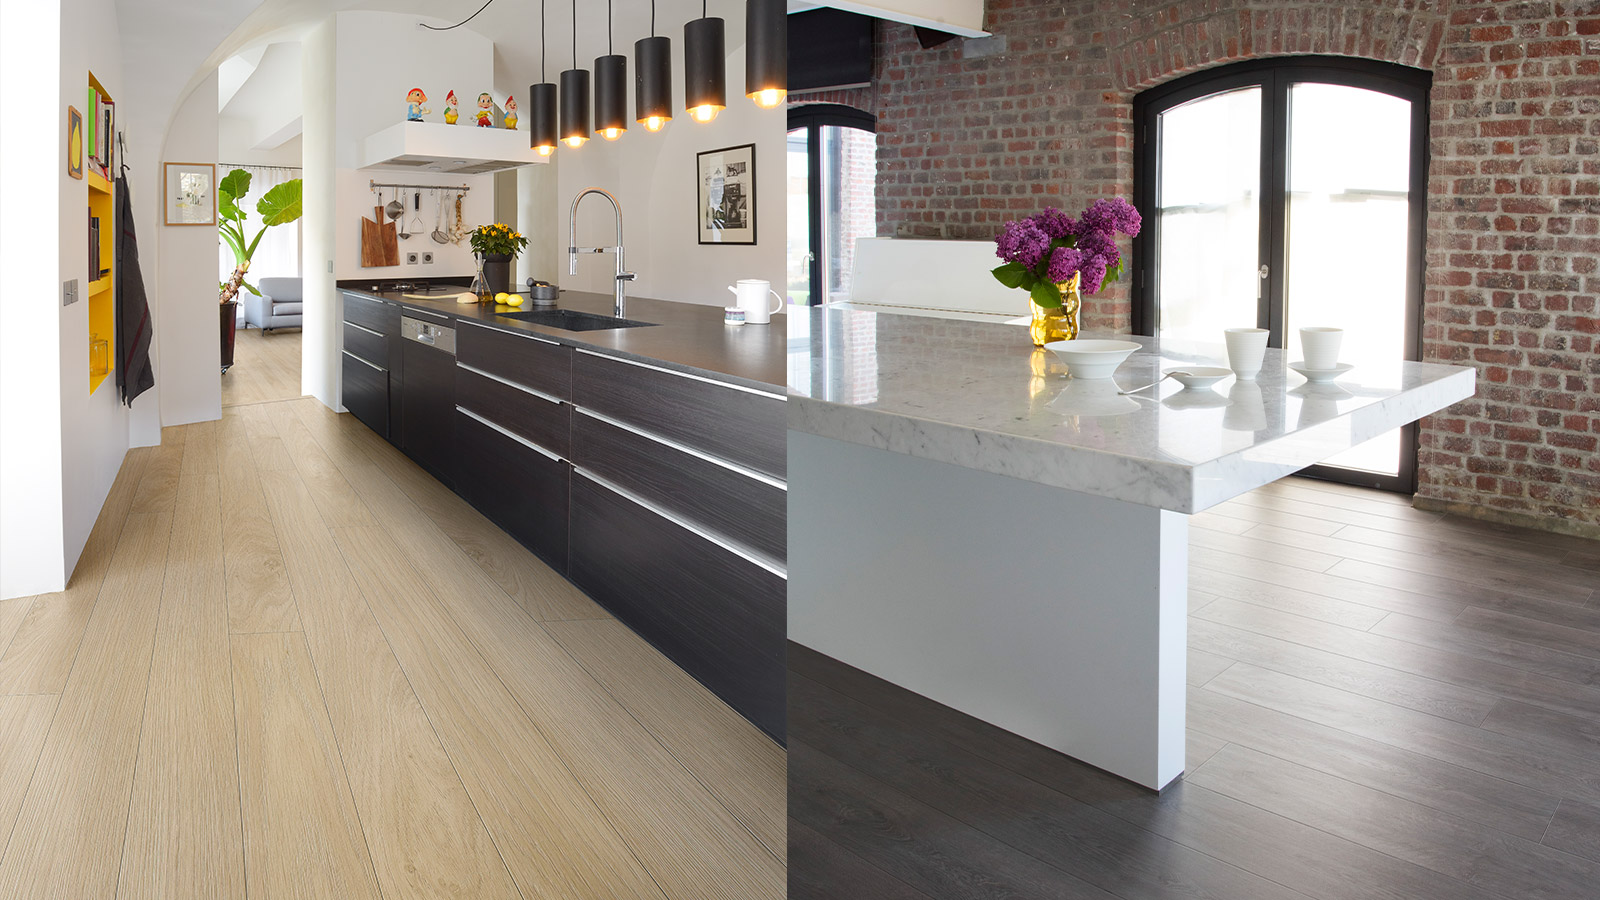 Full Size of Bodenbelag Küche Flur Kautschuk Bodenbelag Küche Küche Boden Wasserdicht Bodenbelag Für Küche Und Wohnzimmer Küche Bodenbelag Küche